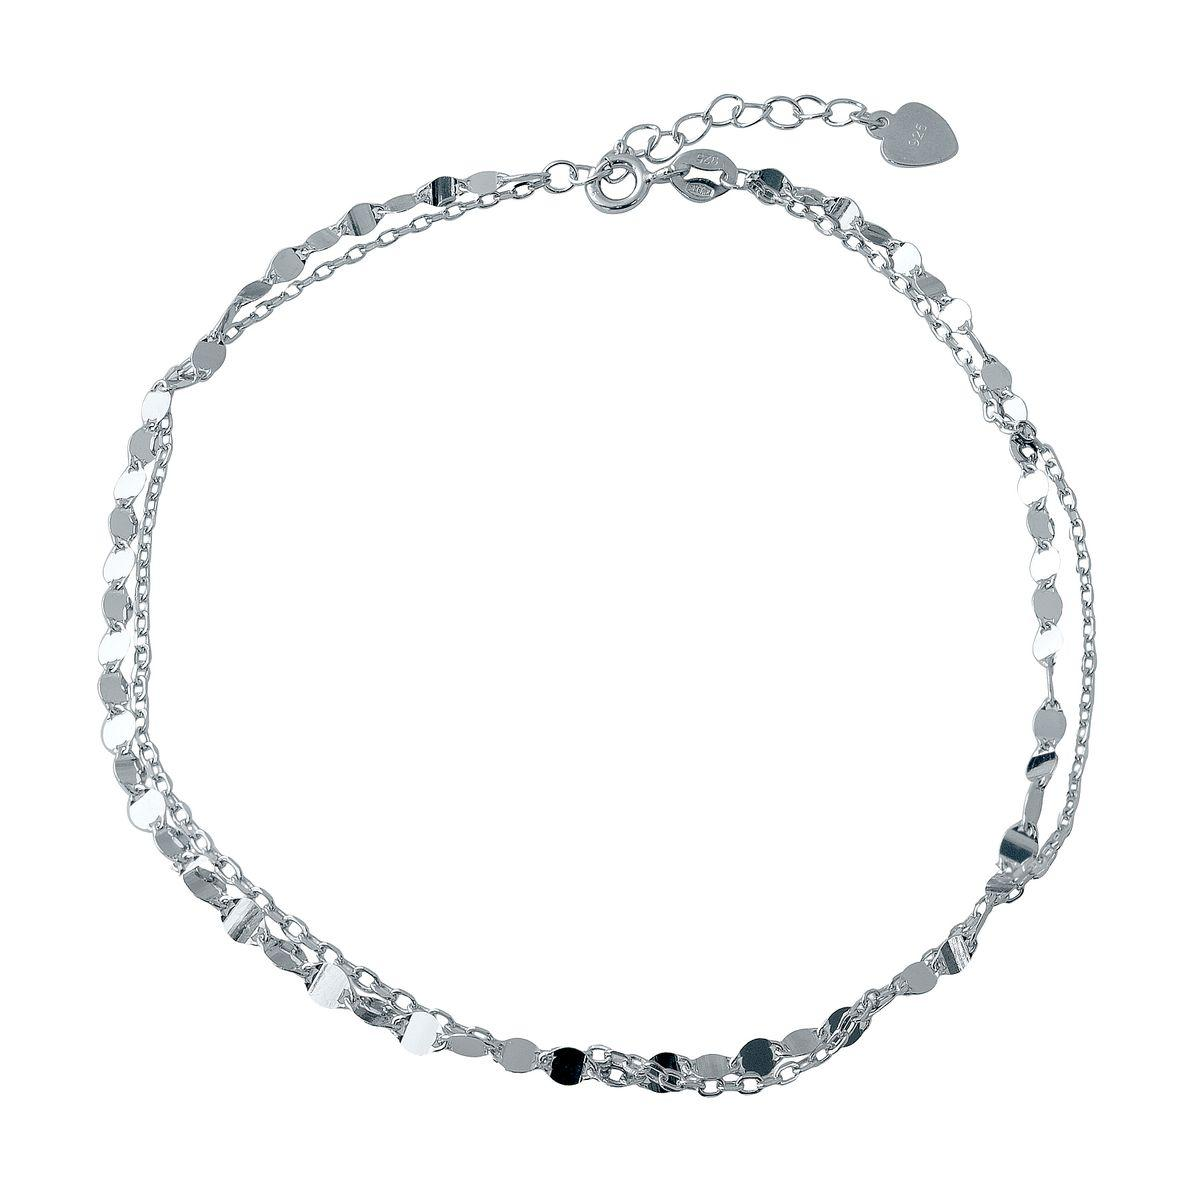 Серебряный браслет на ногу DreamJewelry без камней (2005711) 2326 размер